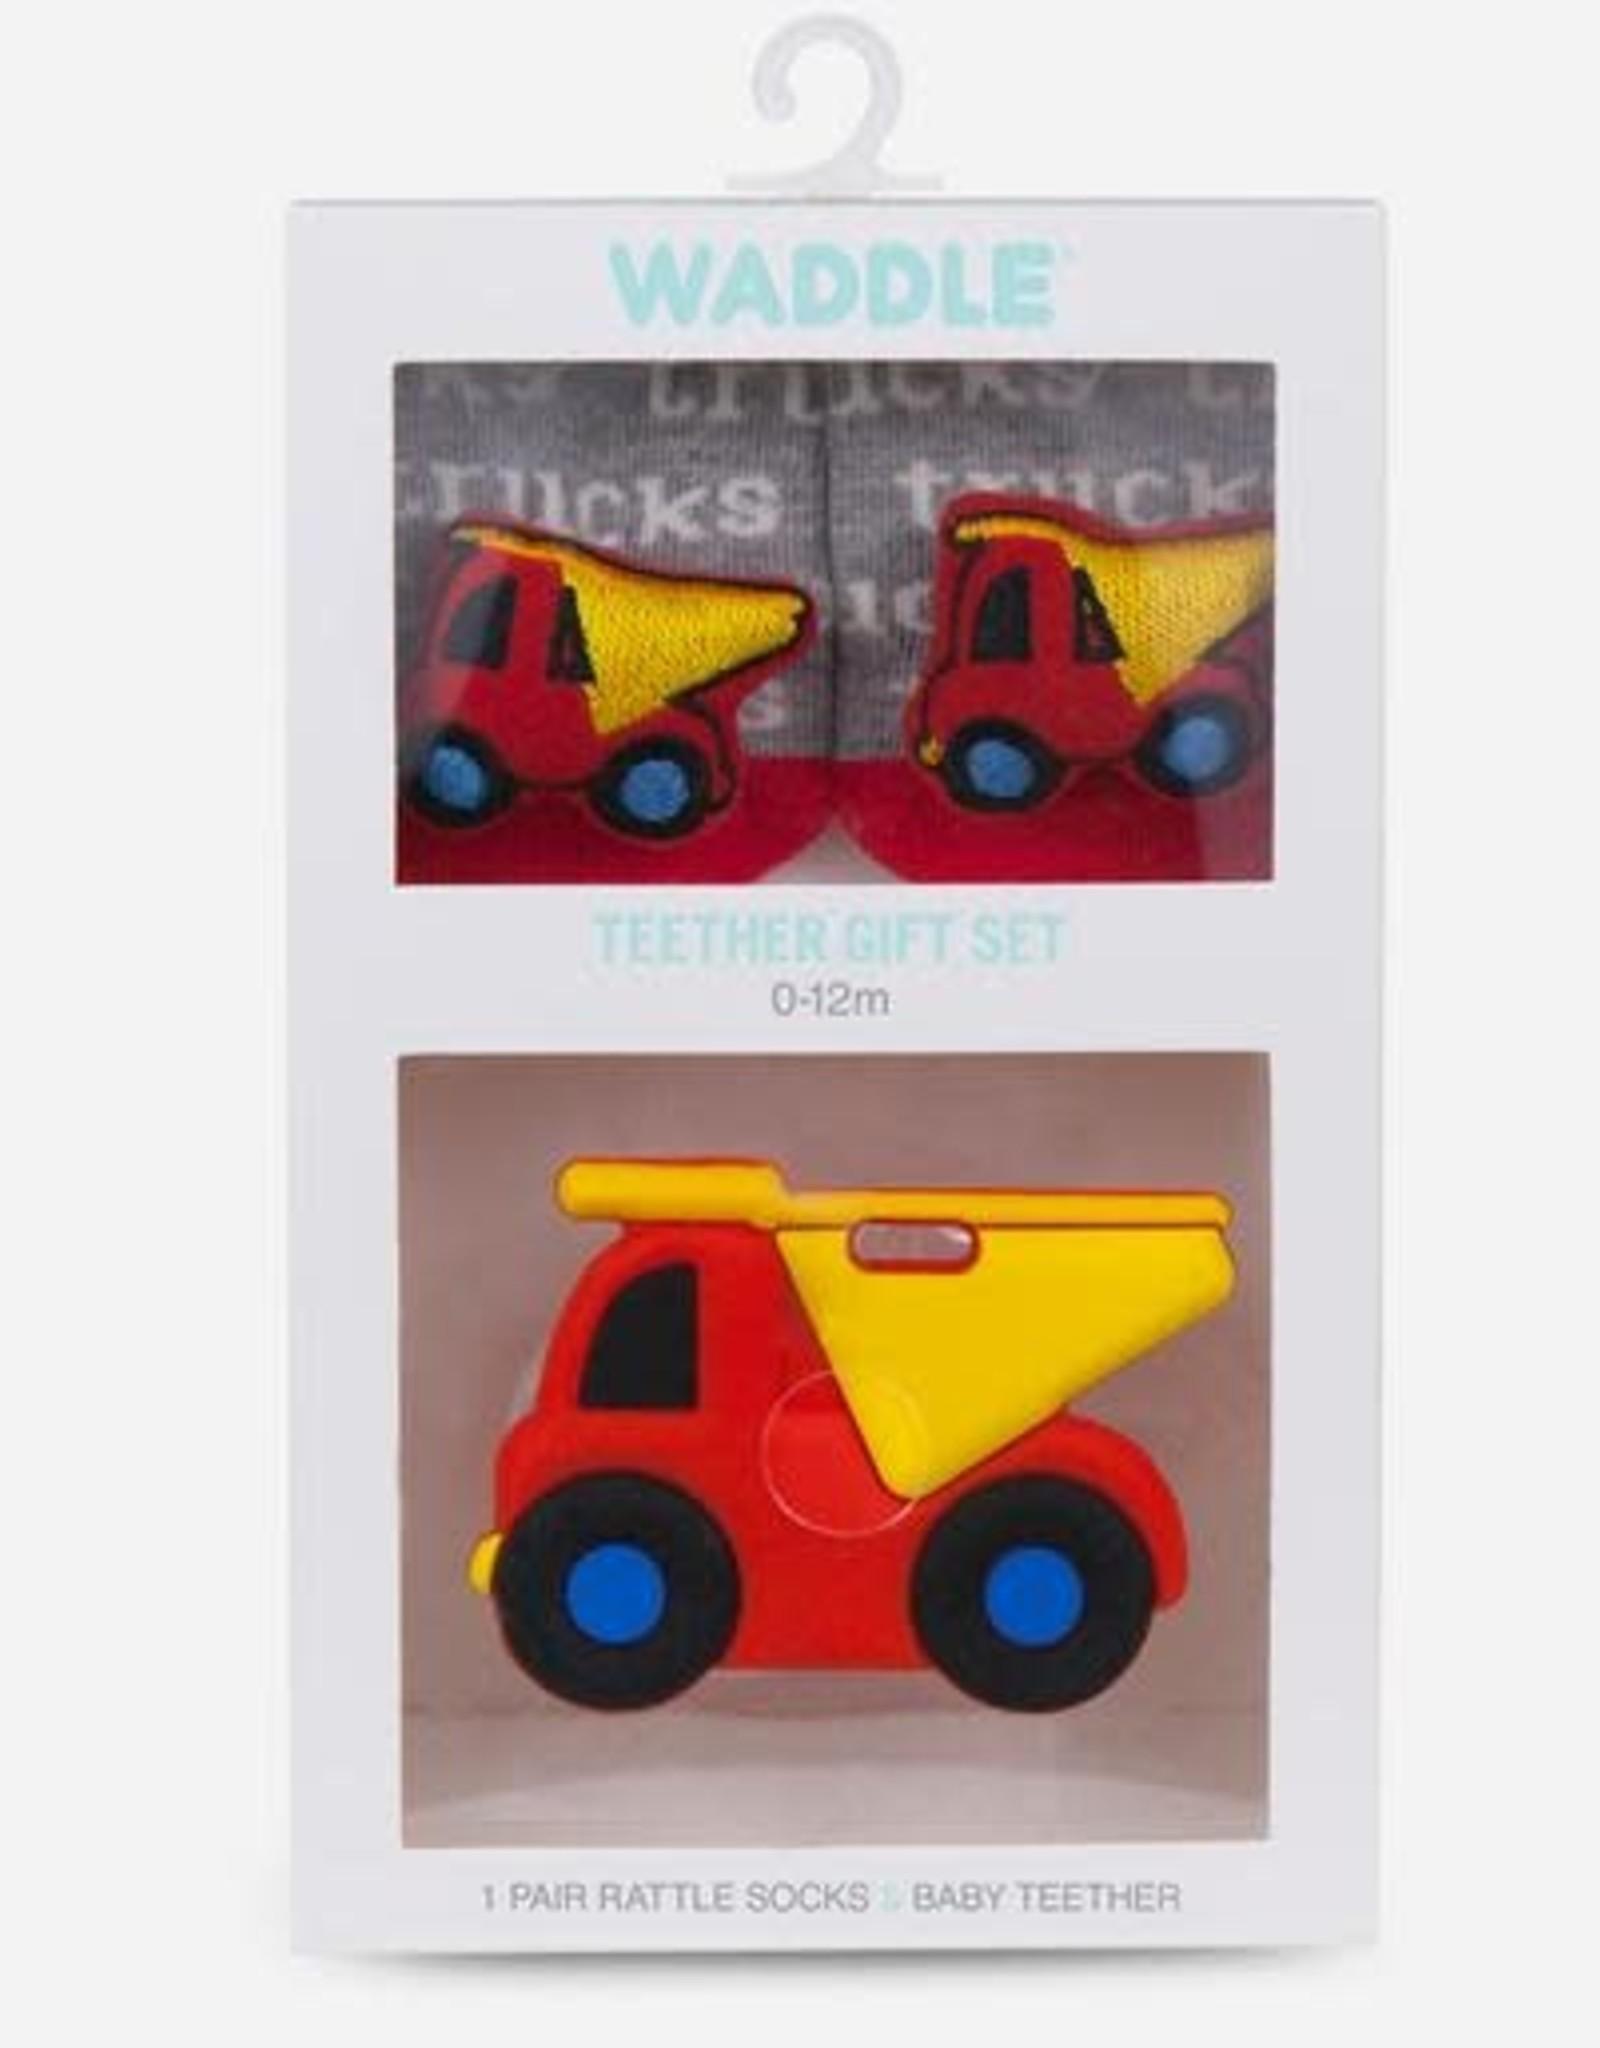 Waddle Truck Teether Gift Set